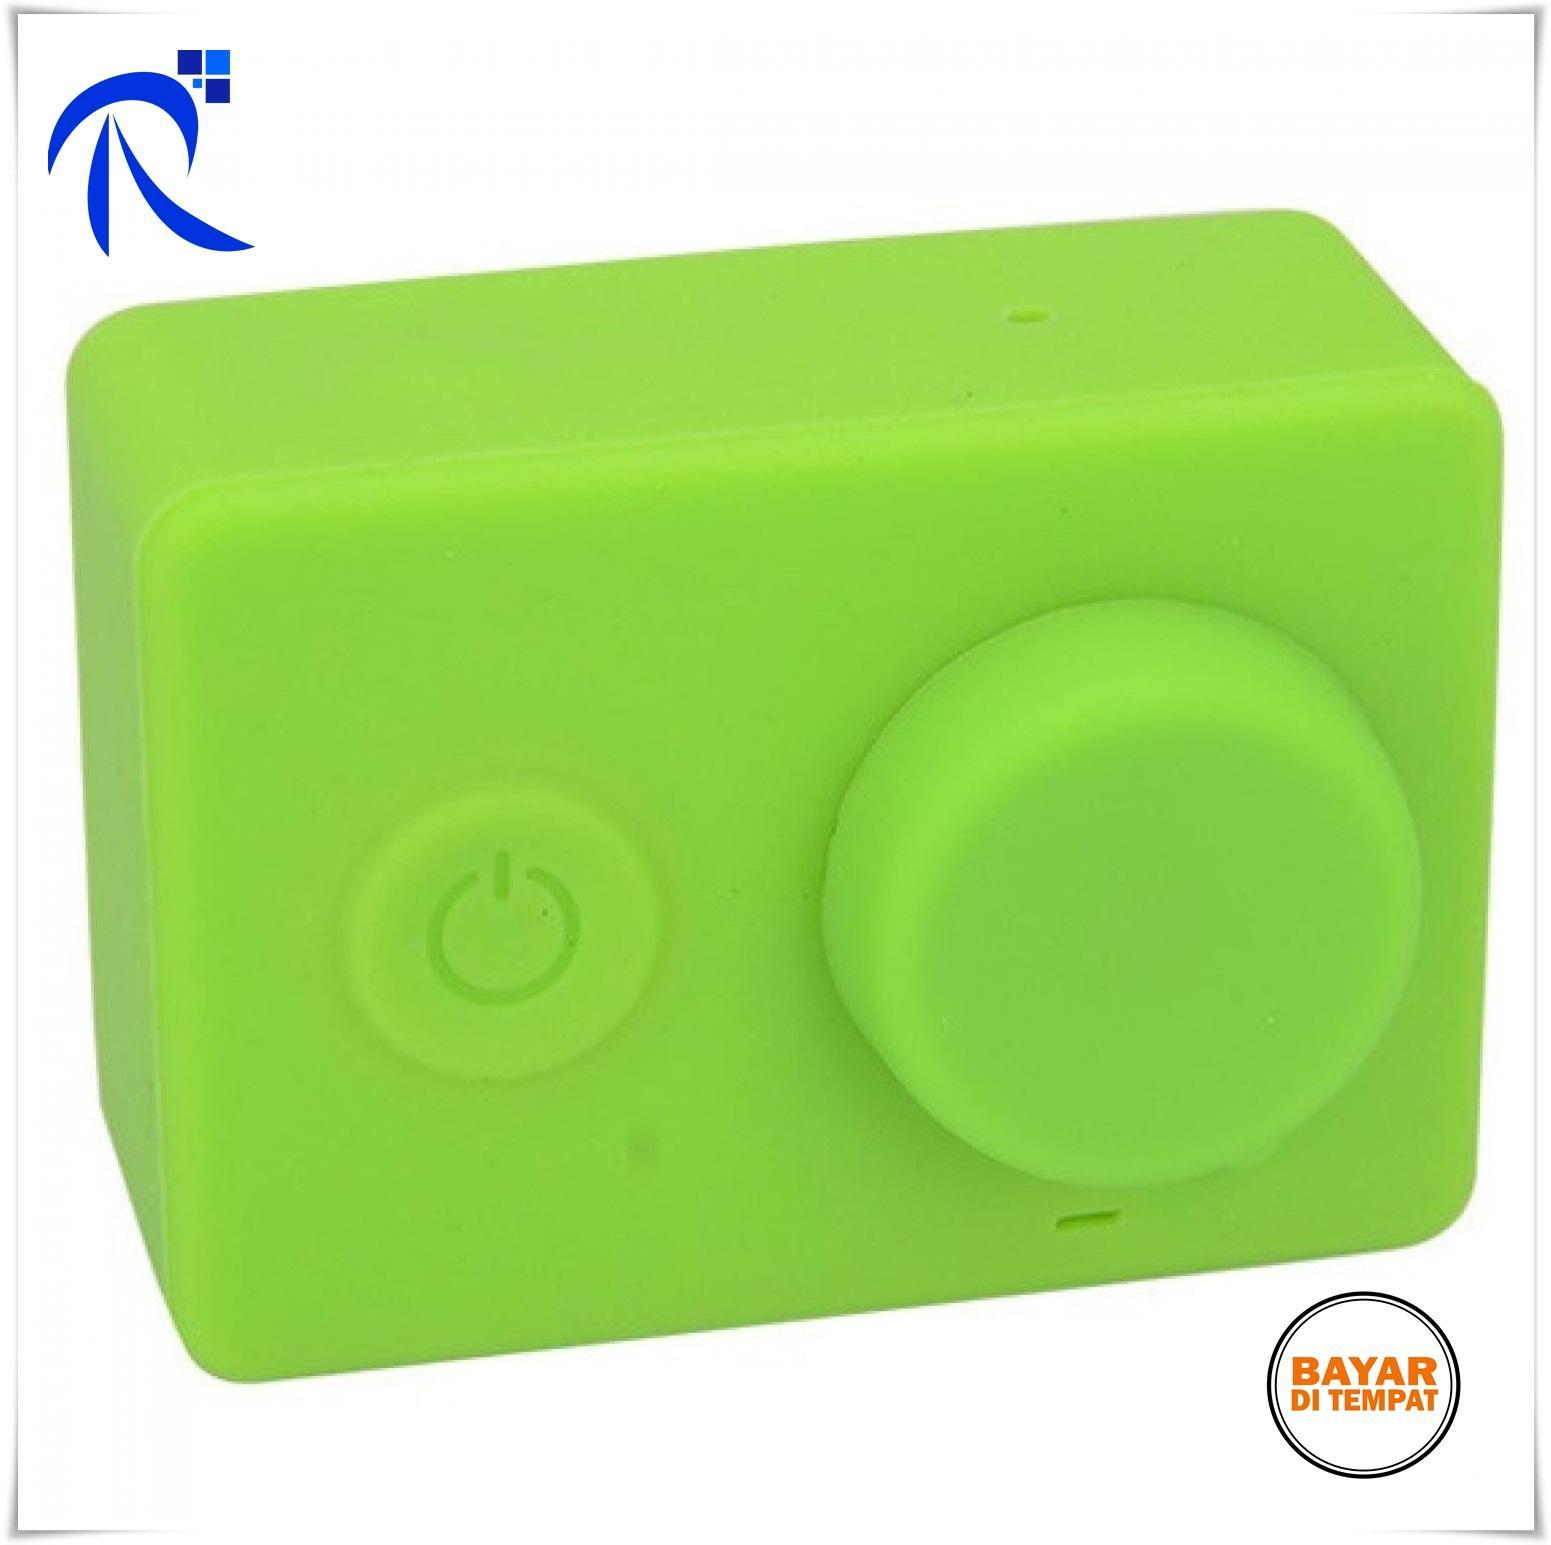 Rimas Silicon Case & Lens Cap untuk Xiaomi Yi - Black / Hitam - Hijau / Green - Casing Cover Silikon Pelindung Camera Kamera Action Berkualitas FREE ONGKIR